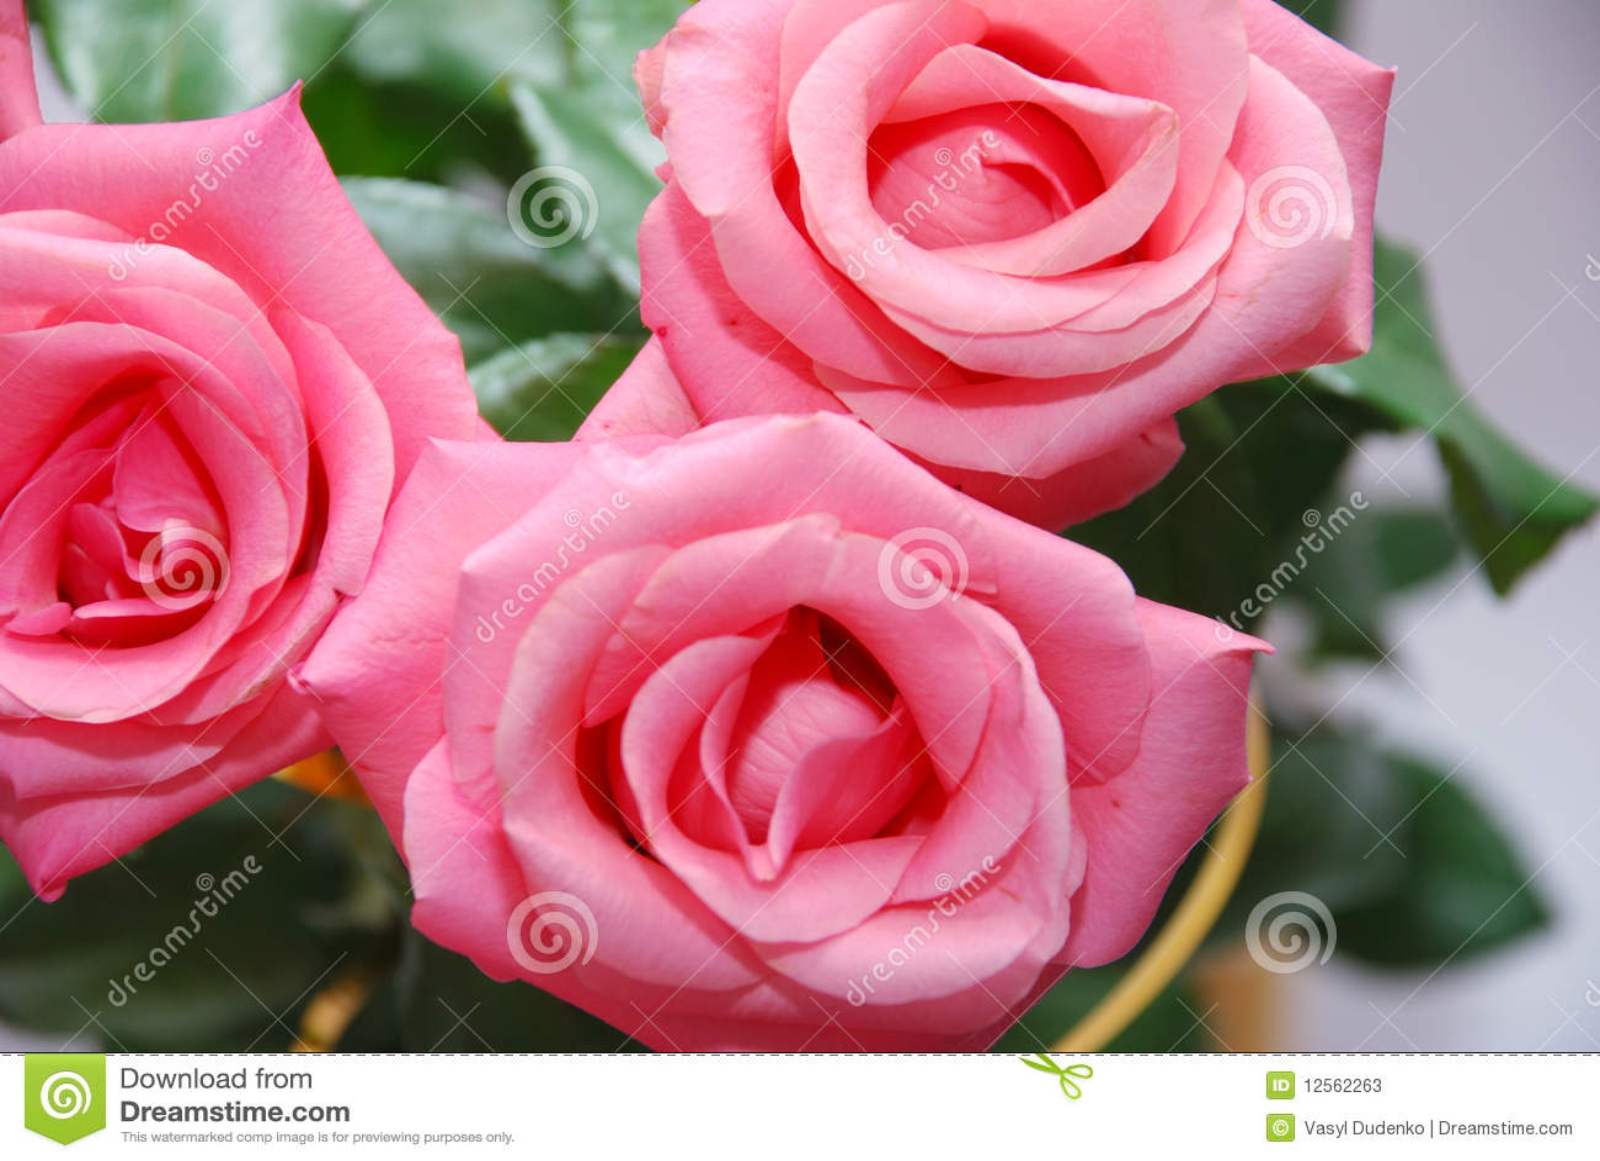 Rosas rosadas hermosas fotos de archivo imagen 12562263 - Rosas rosas hermosas ...